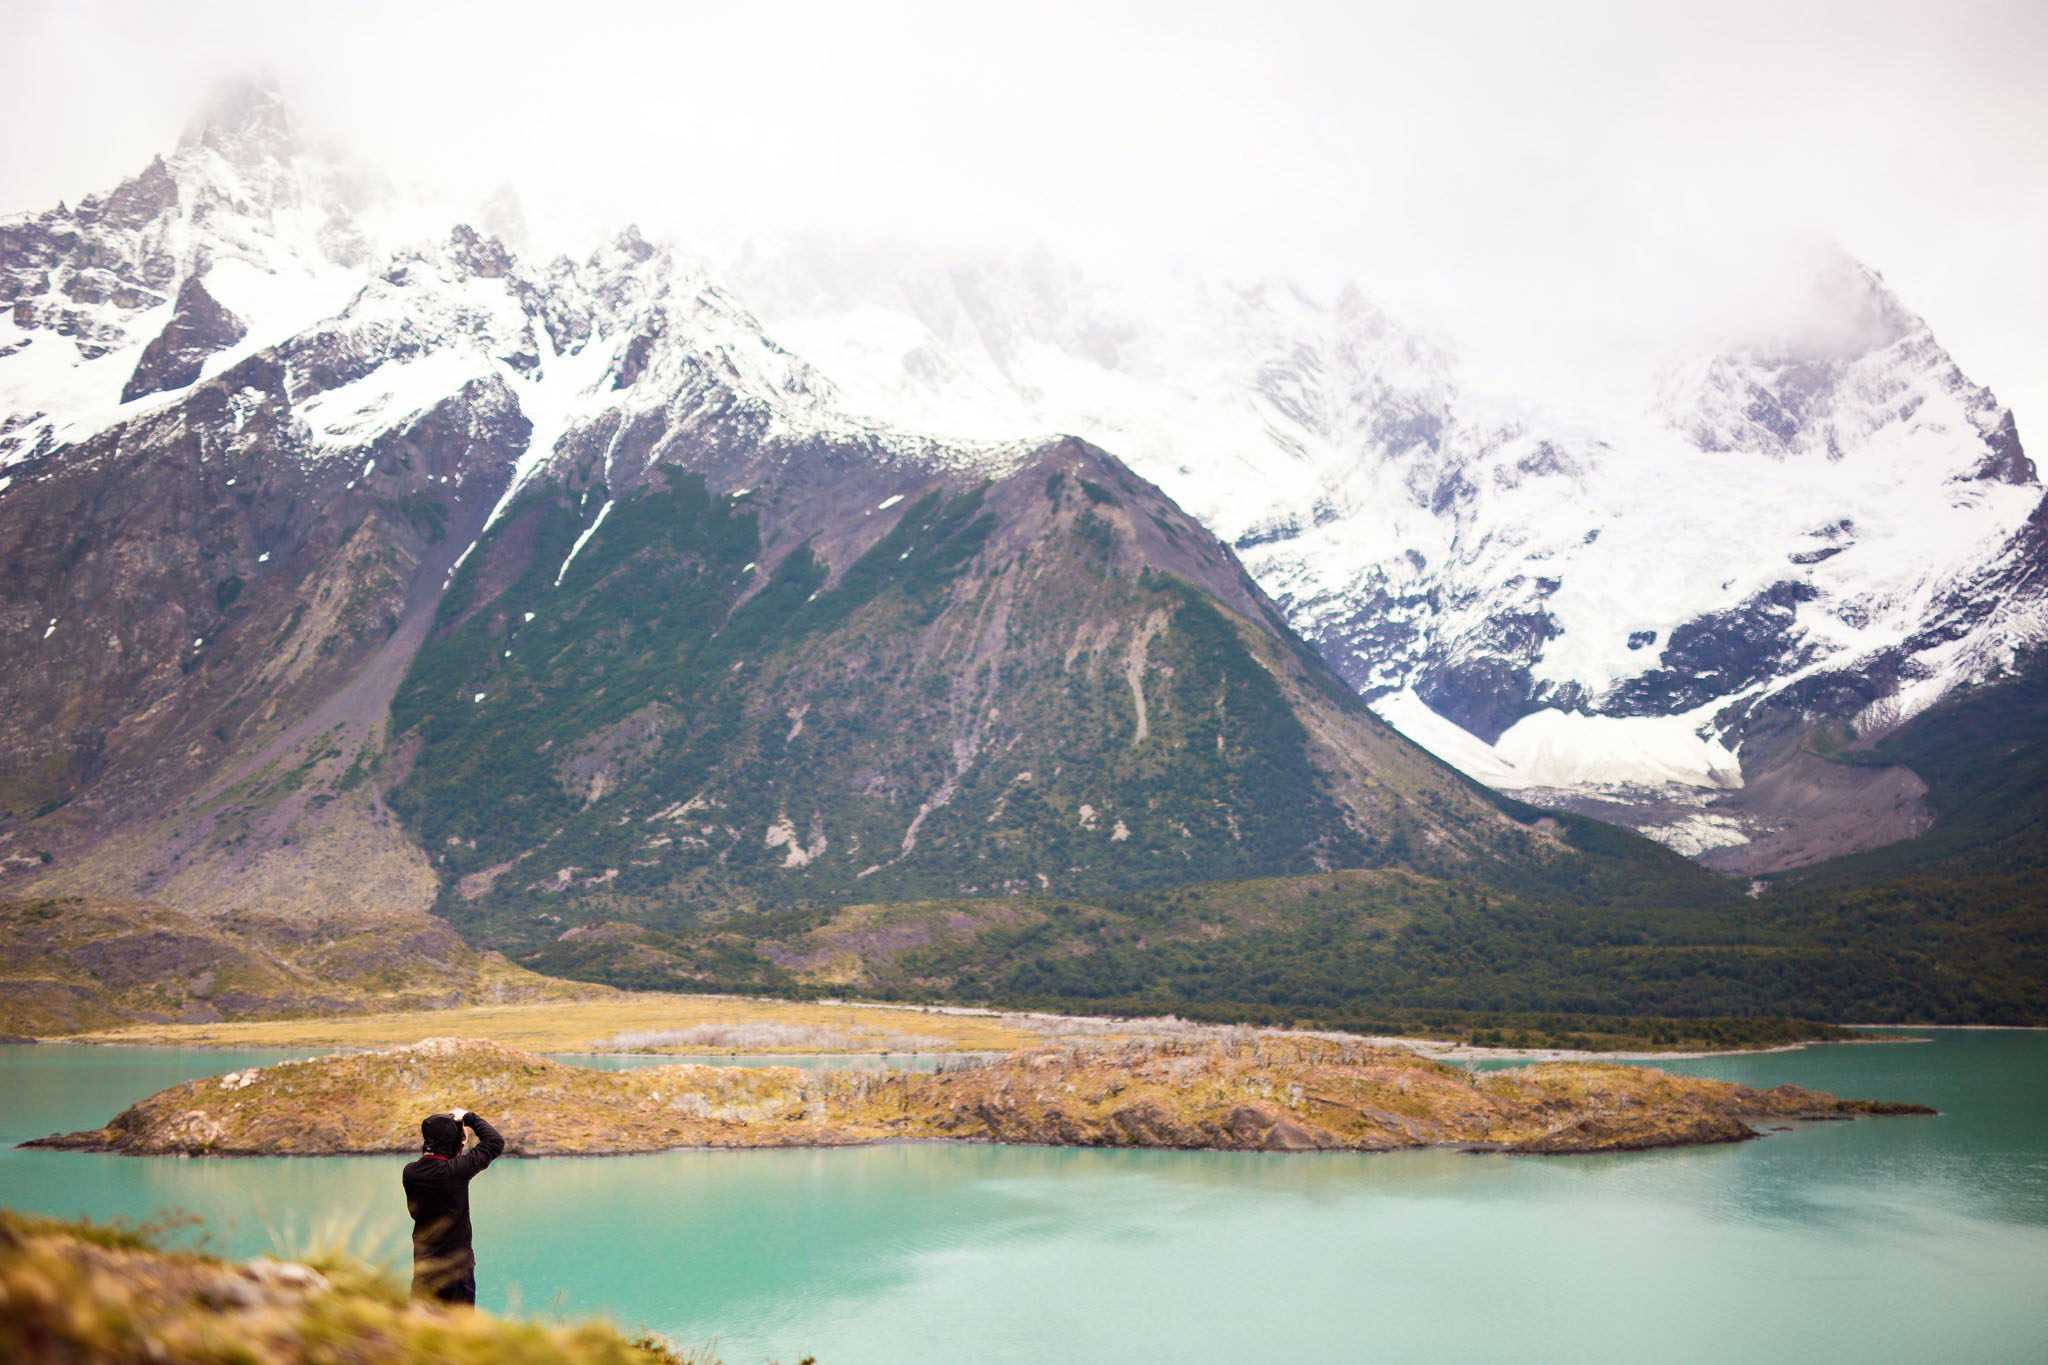 Wedding-Travellers-Overlanding-Destination-Wedding-Chile-Torres-del-Paine-turquoise-cuernos-lago-lake-nordenskjold-photographer-taking-picture